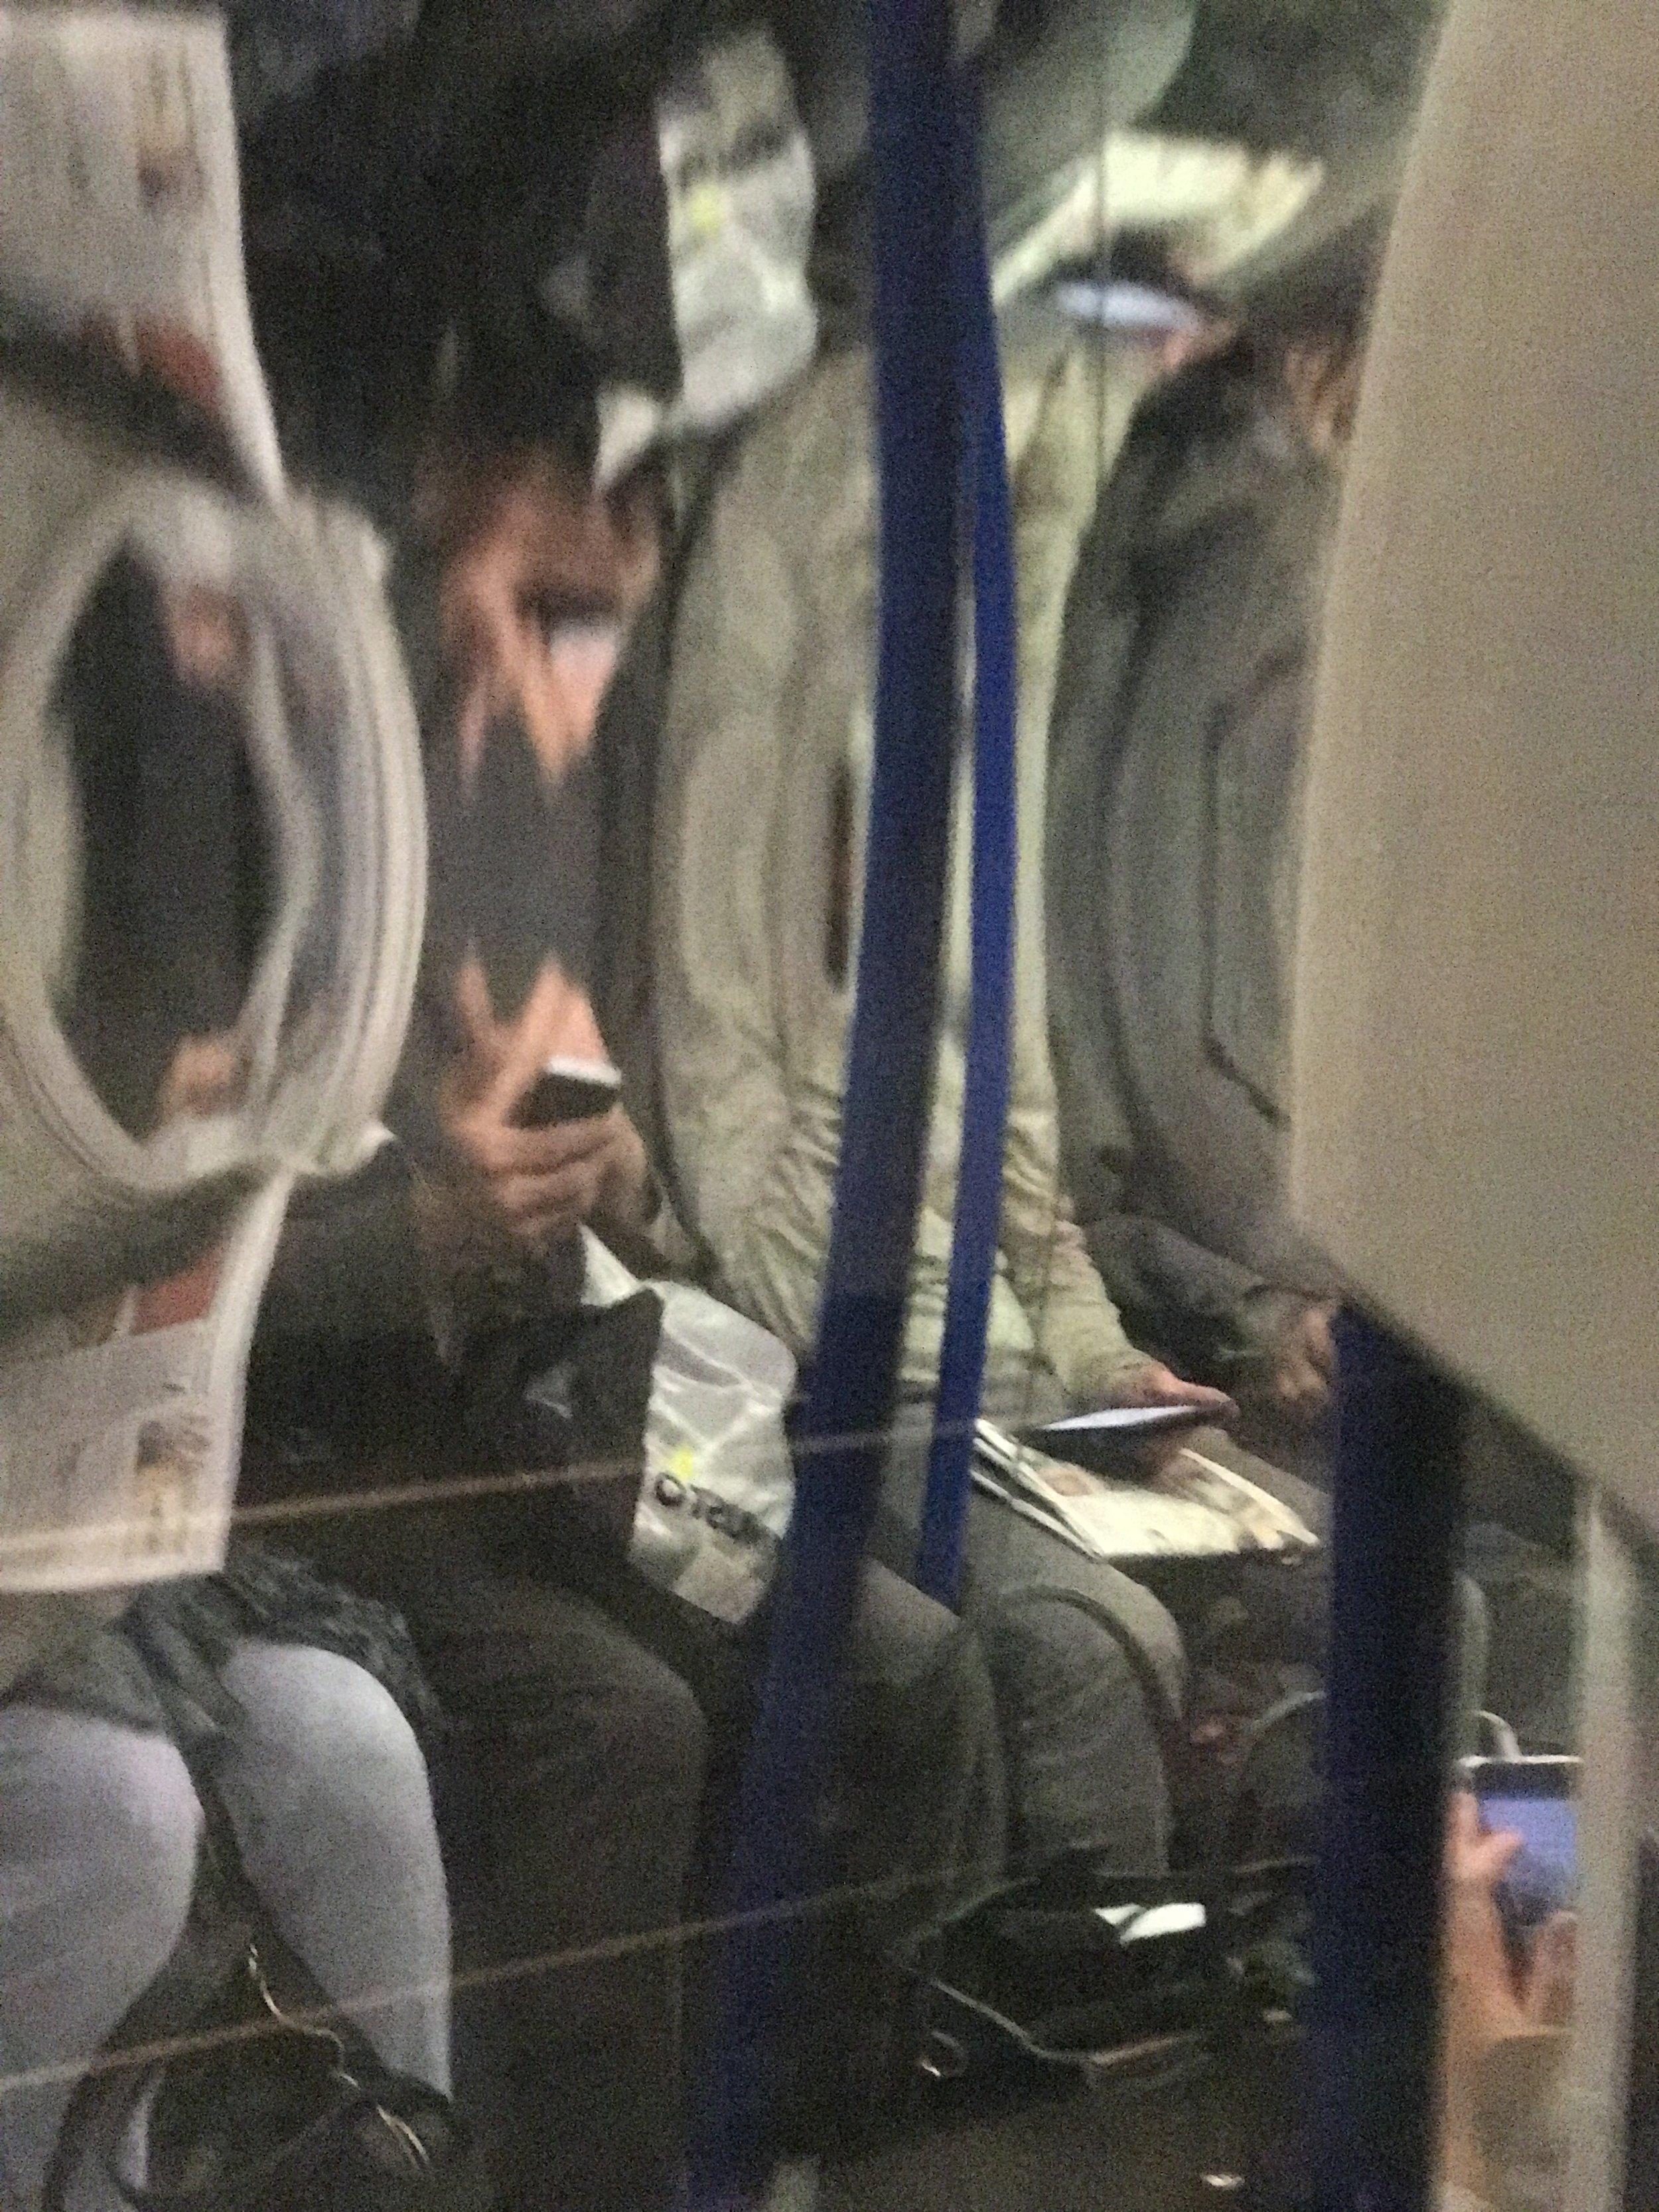 London_Tube_Train_Window.jpg